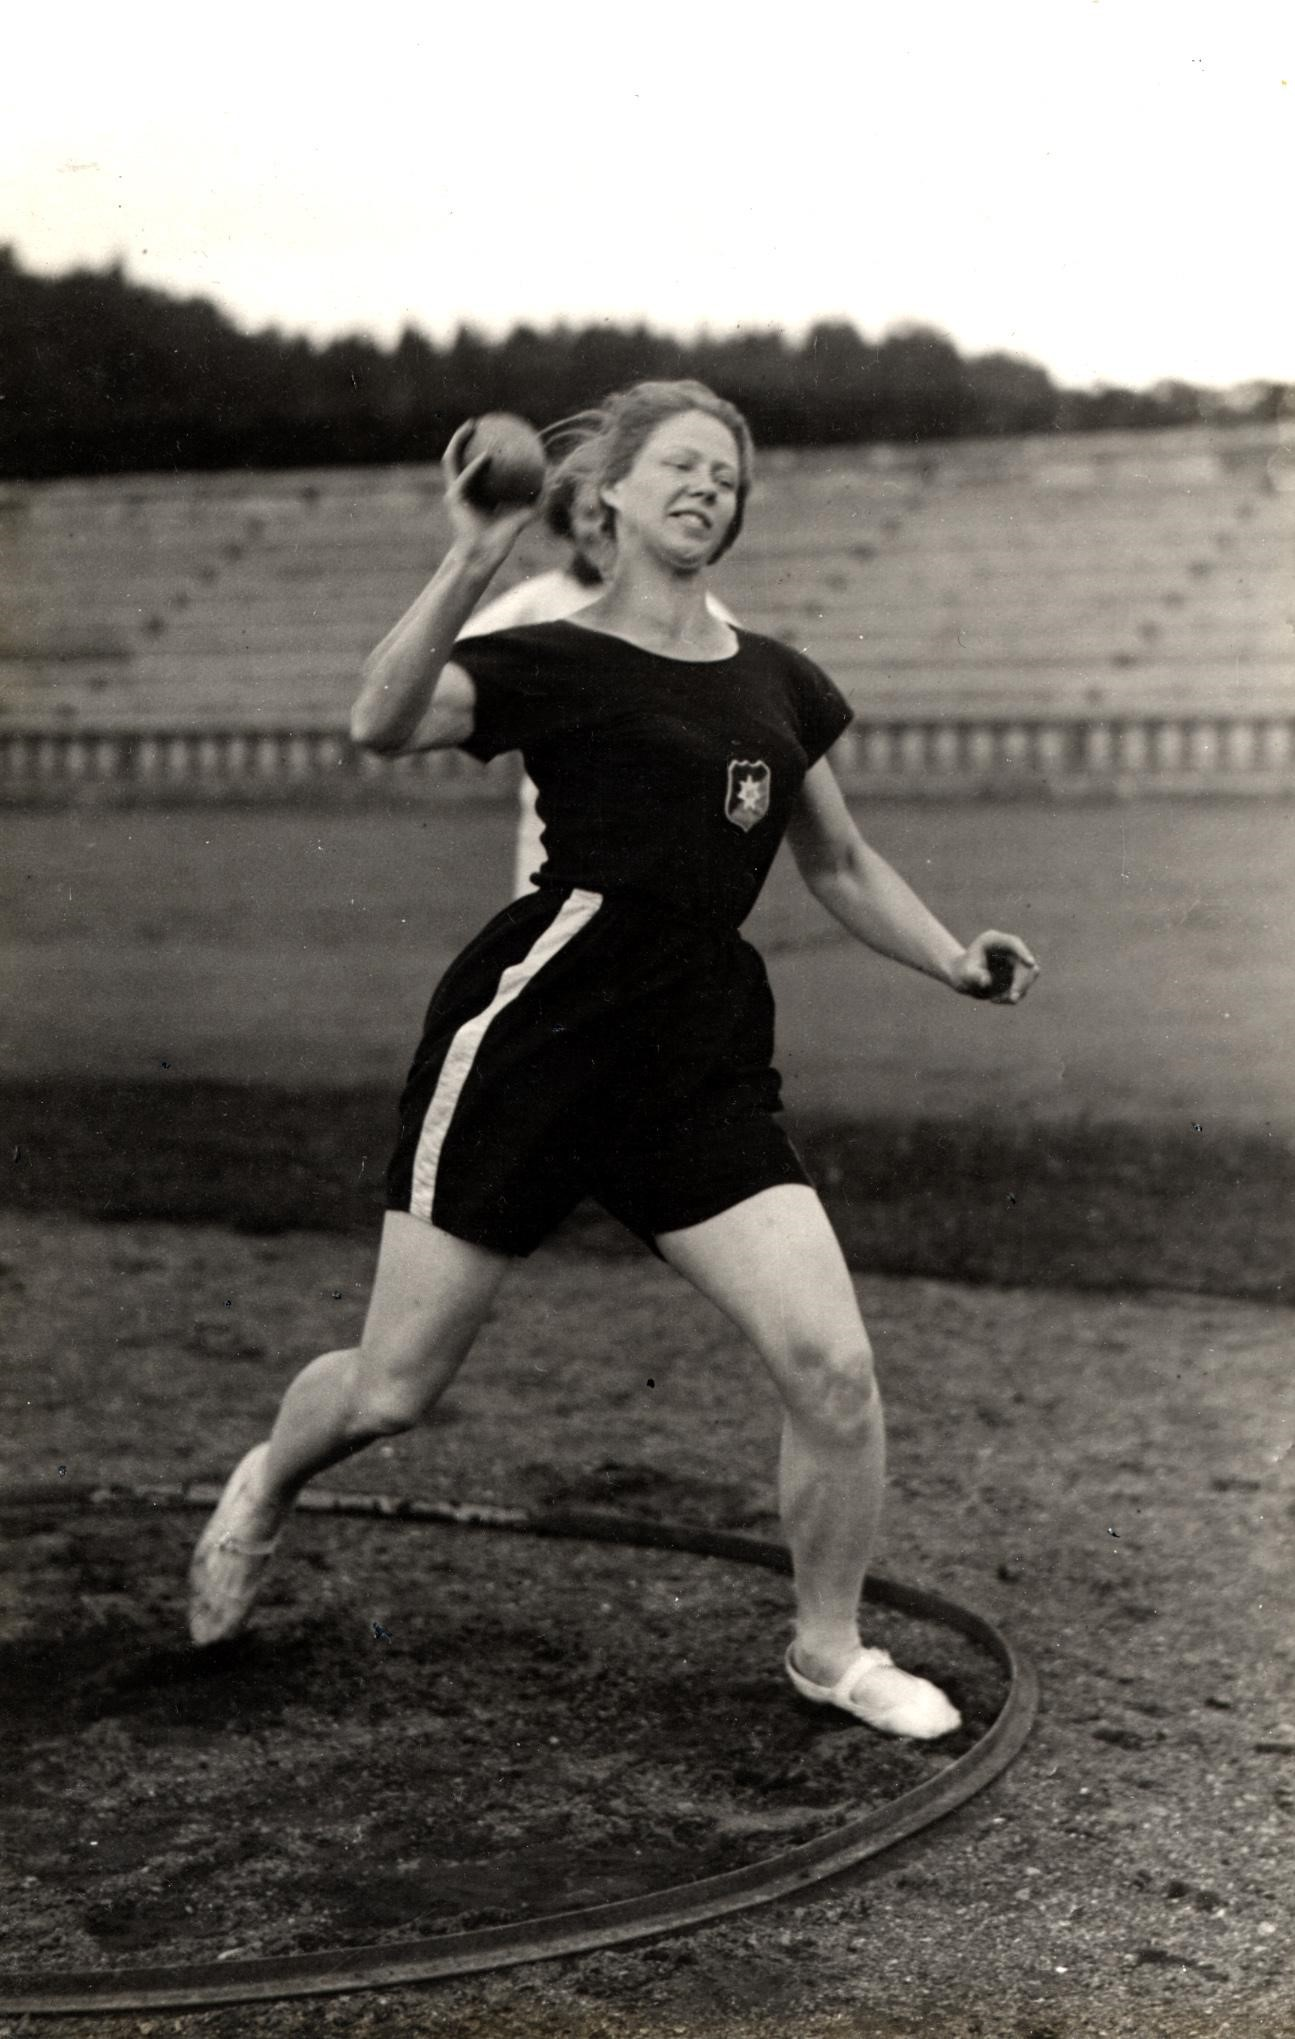 Ruth Svedberg trains the shot put at the 1926 Women's World Games in Gothenburg. Photo: Bertil Norberg, Svenska Bildcentralen (Kvinnsam, Gothenburg University Library)